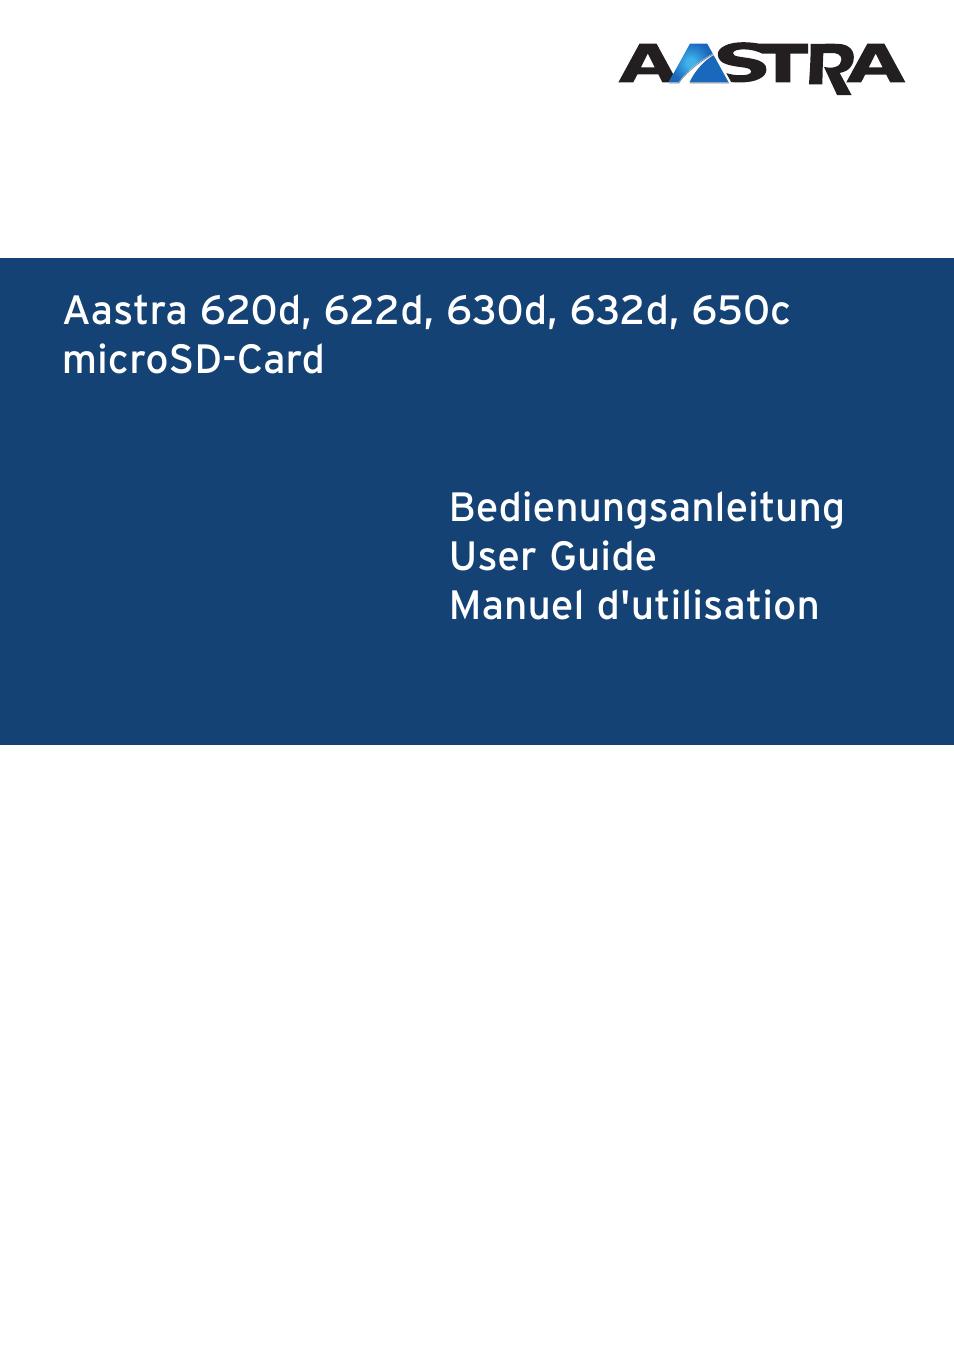 aastra microsd card user guide user manual 22 pages hp 12c manual online hp 12c manual online